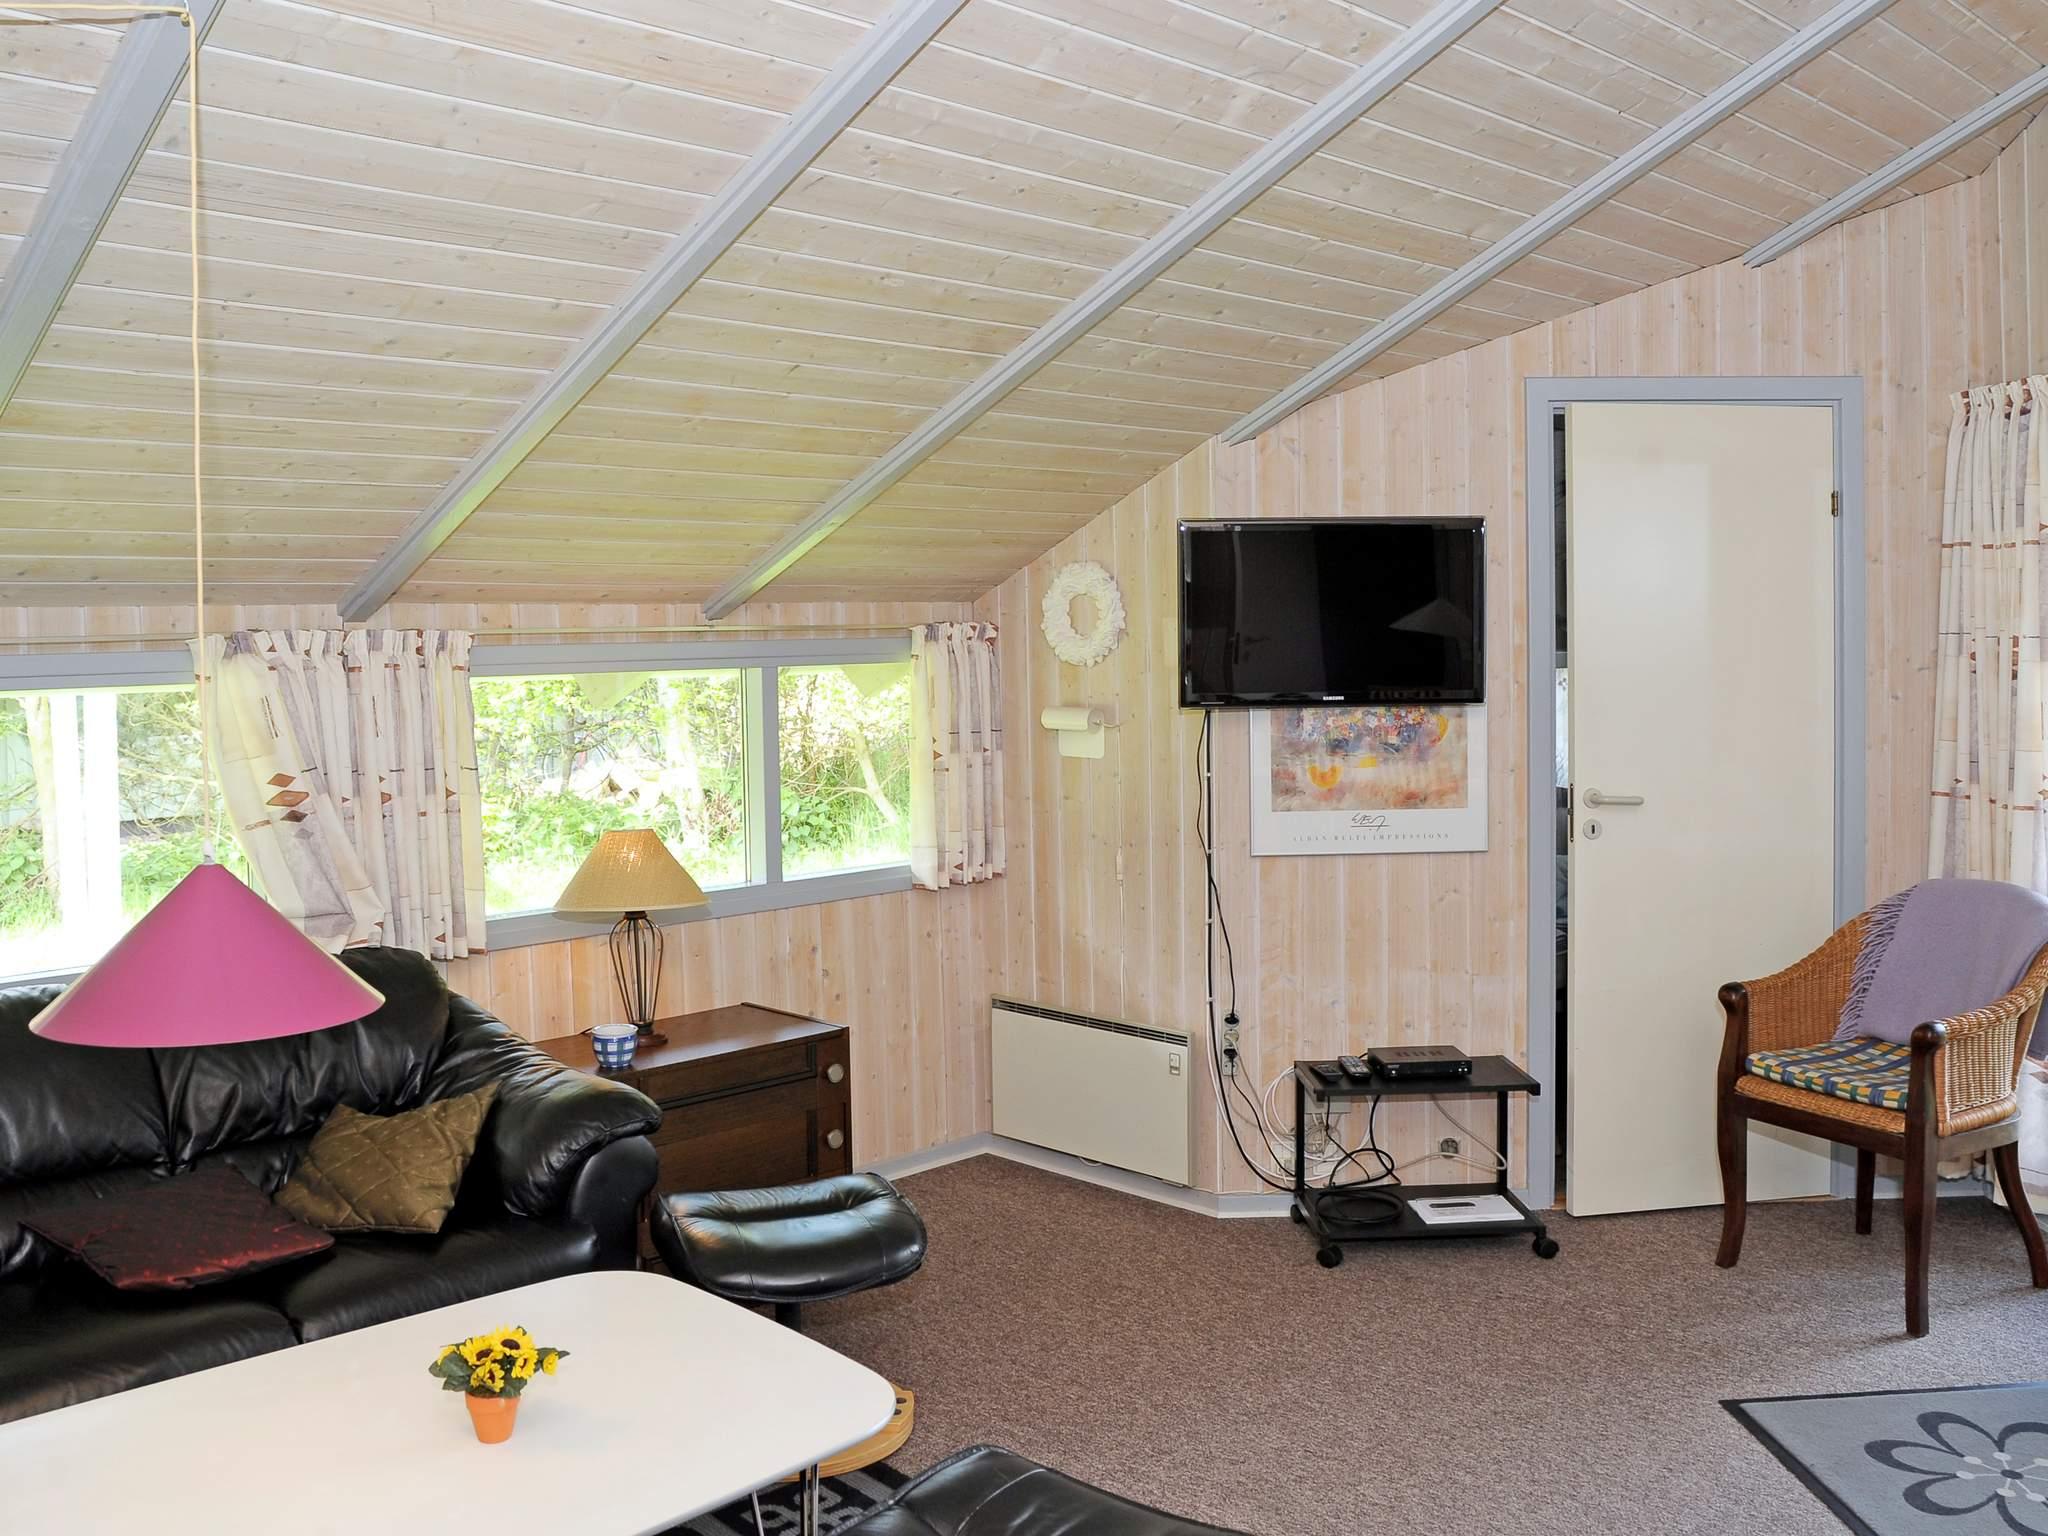 Ferienhaus Ristinge (93203), Ristinge, , Langeland, Dänemark, Bild 18